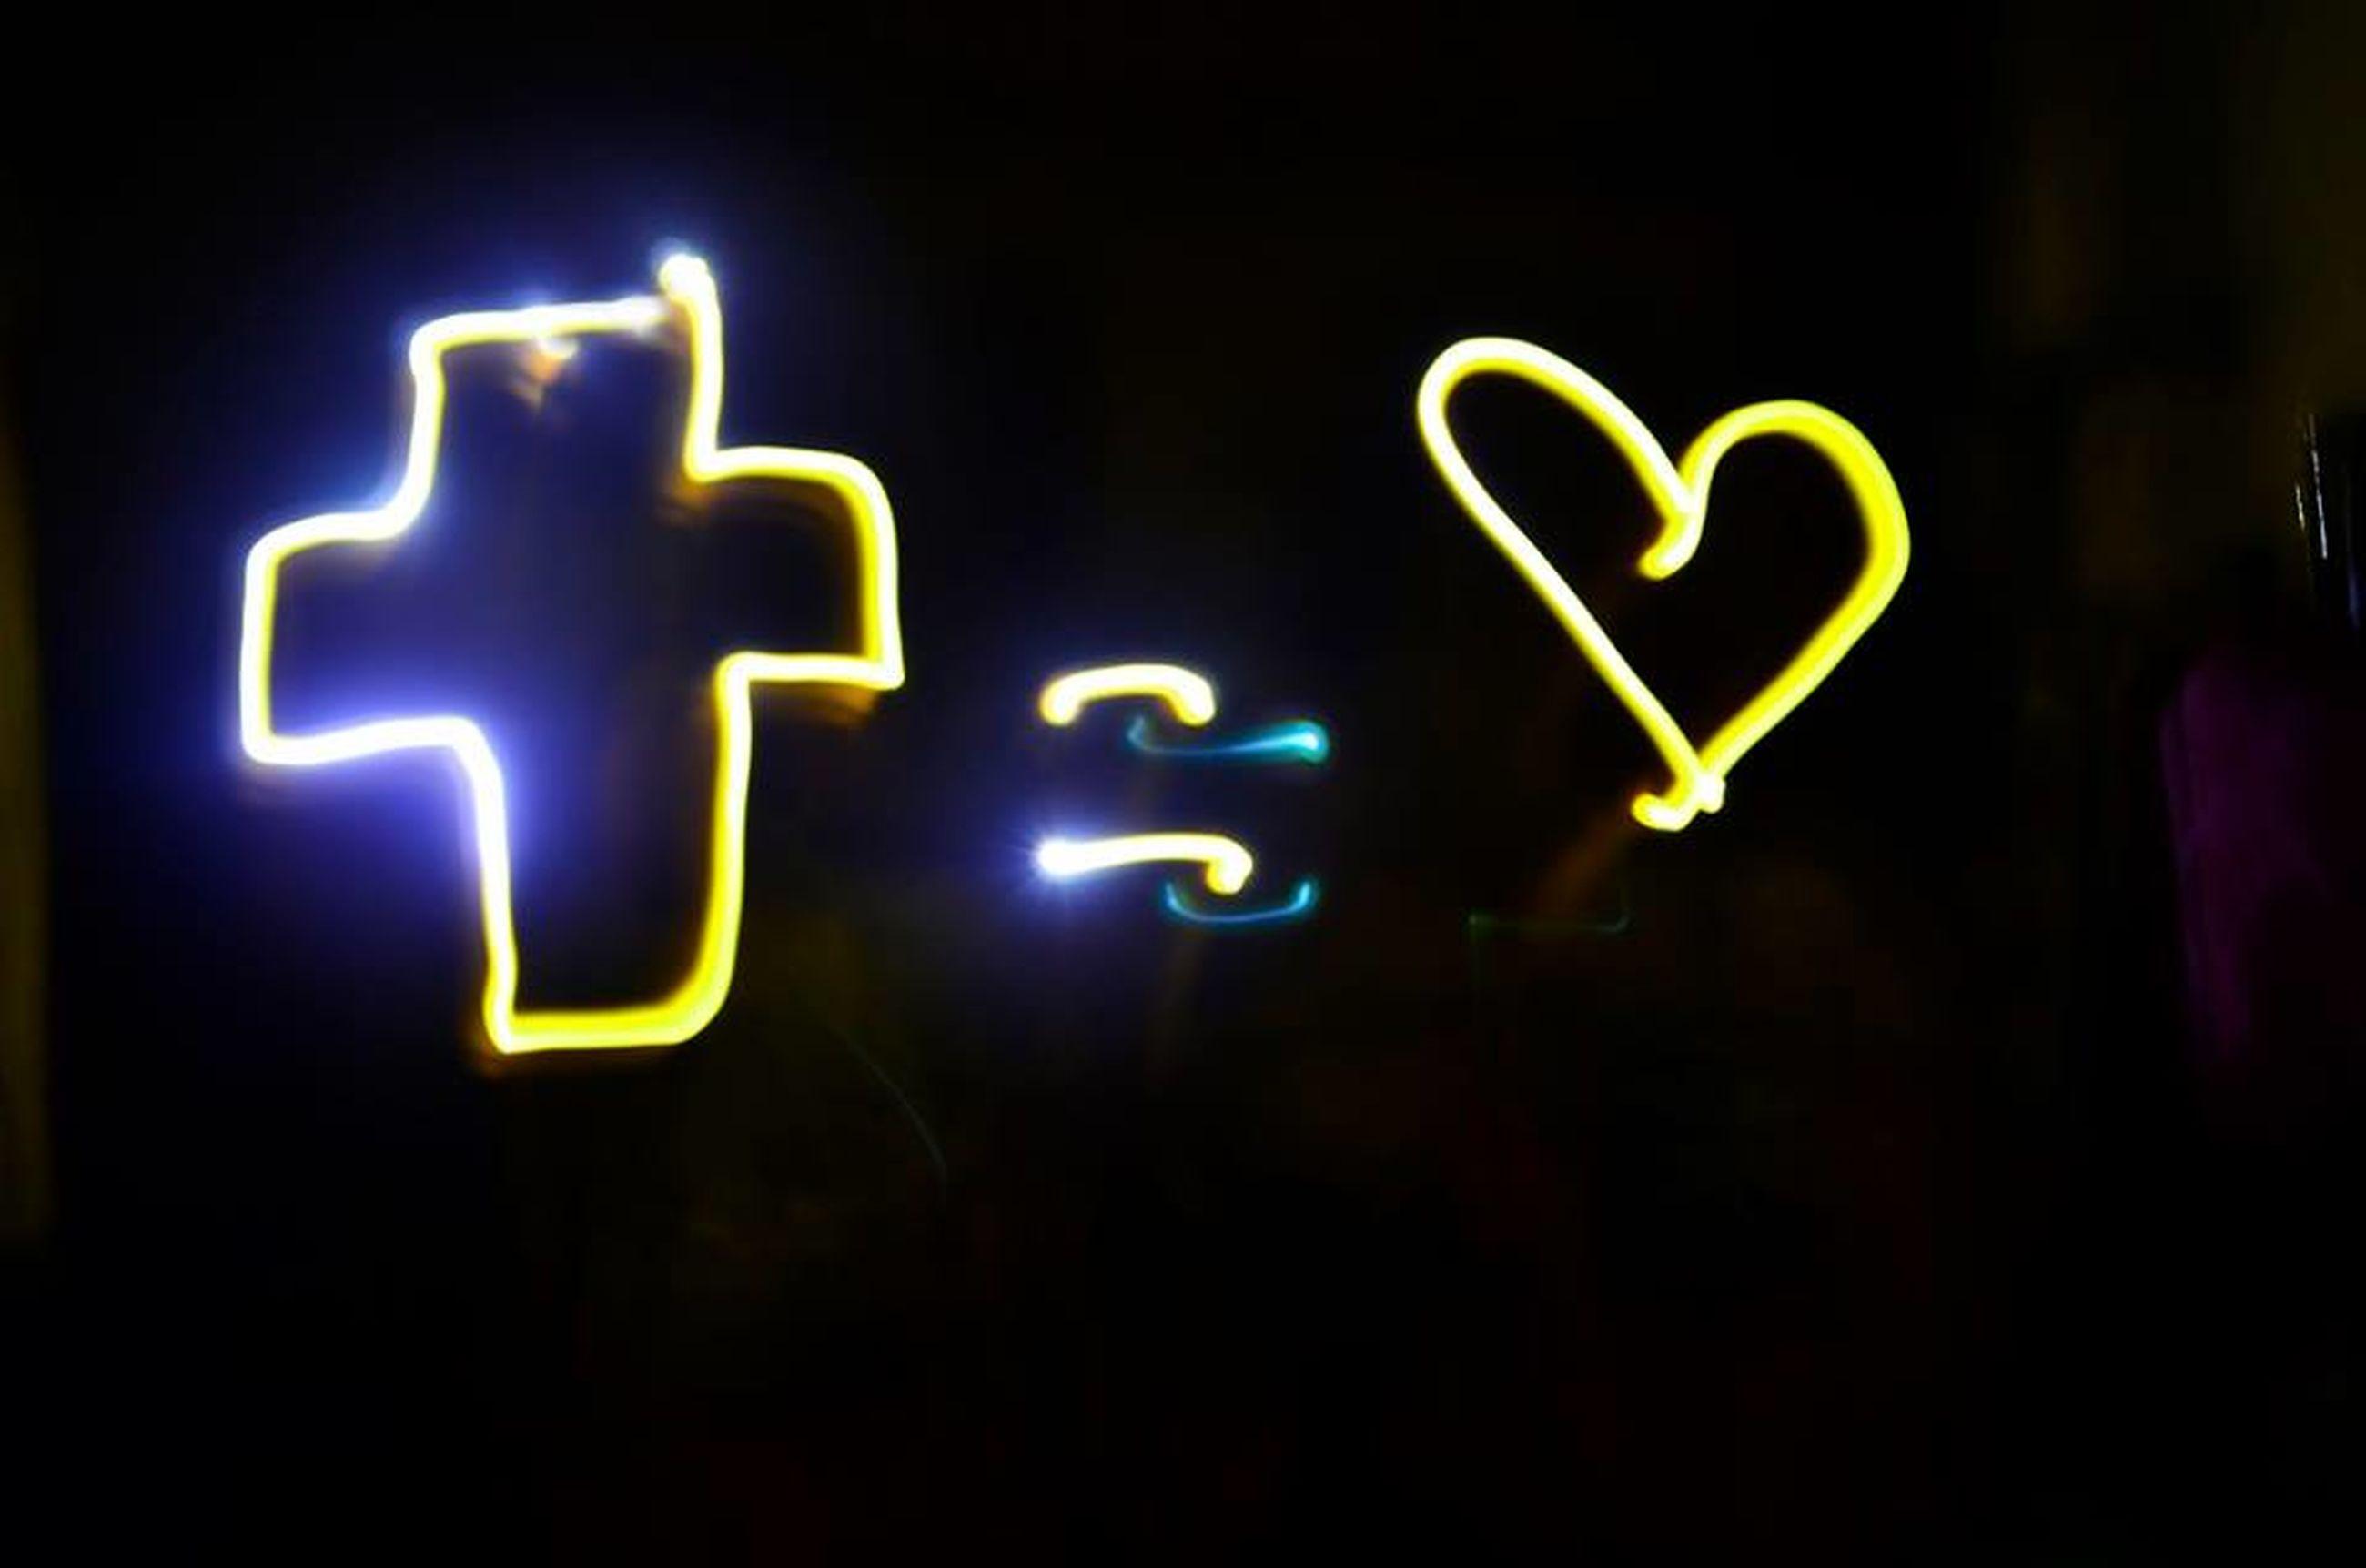 illuminated, text, western script, communication, night, close-up, human representation, capital letter, neon, indoors, glowing, black background, art and craft, creativity, art, sign, symbol, studio shot, ideas